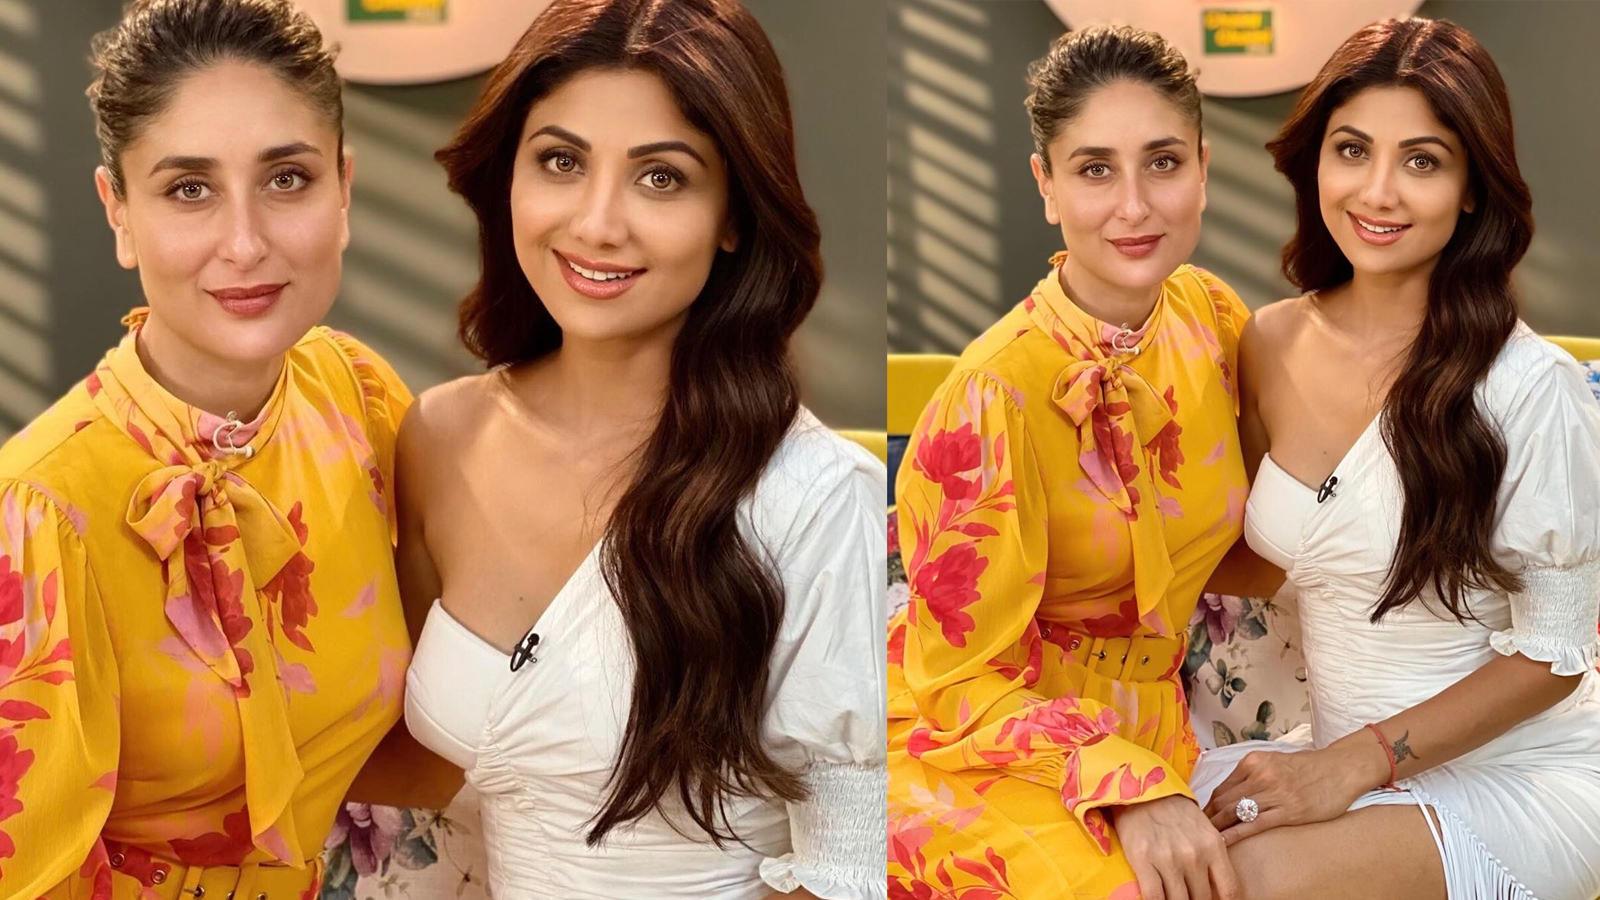 Shilpa Shetty shares stunning pic with Kareena Kapoor, says girls are made of 'sarcasm, sunshine and a killer jawline'